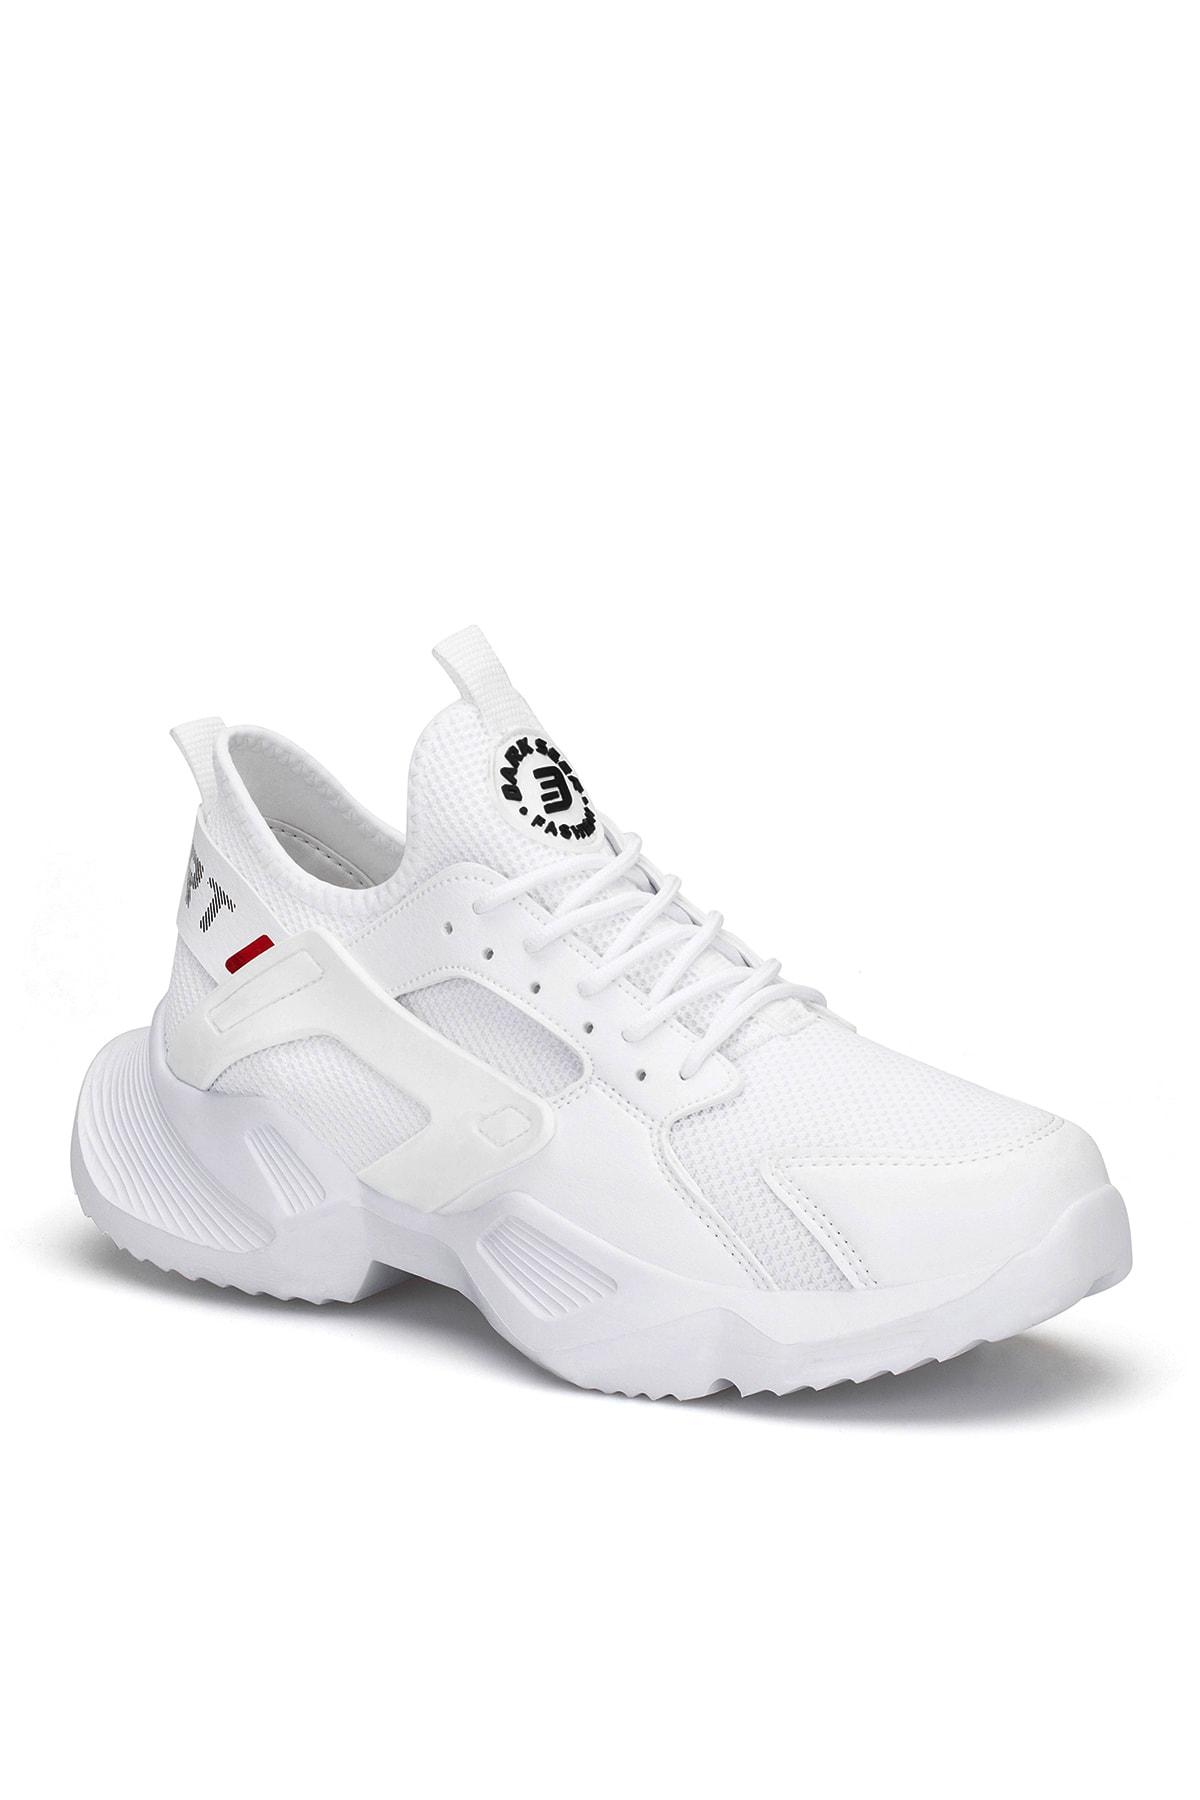 DARK SEER Unisex Beyaz Sneaker DS.MJ1902 1